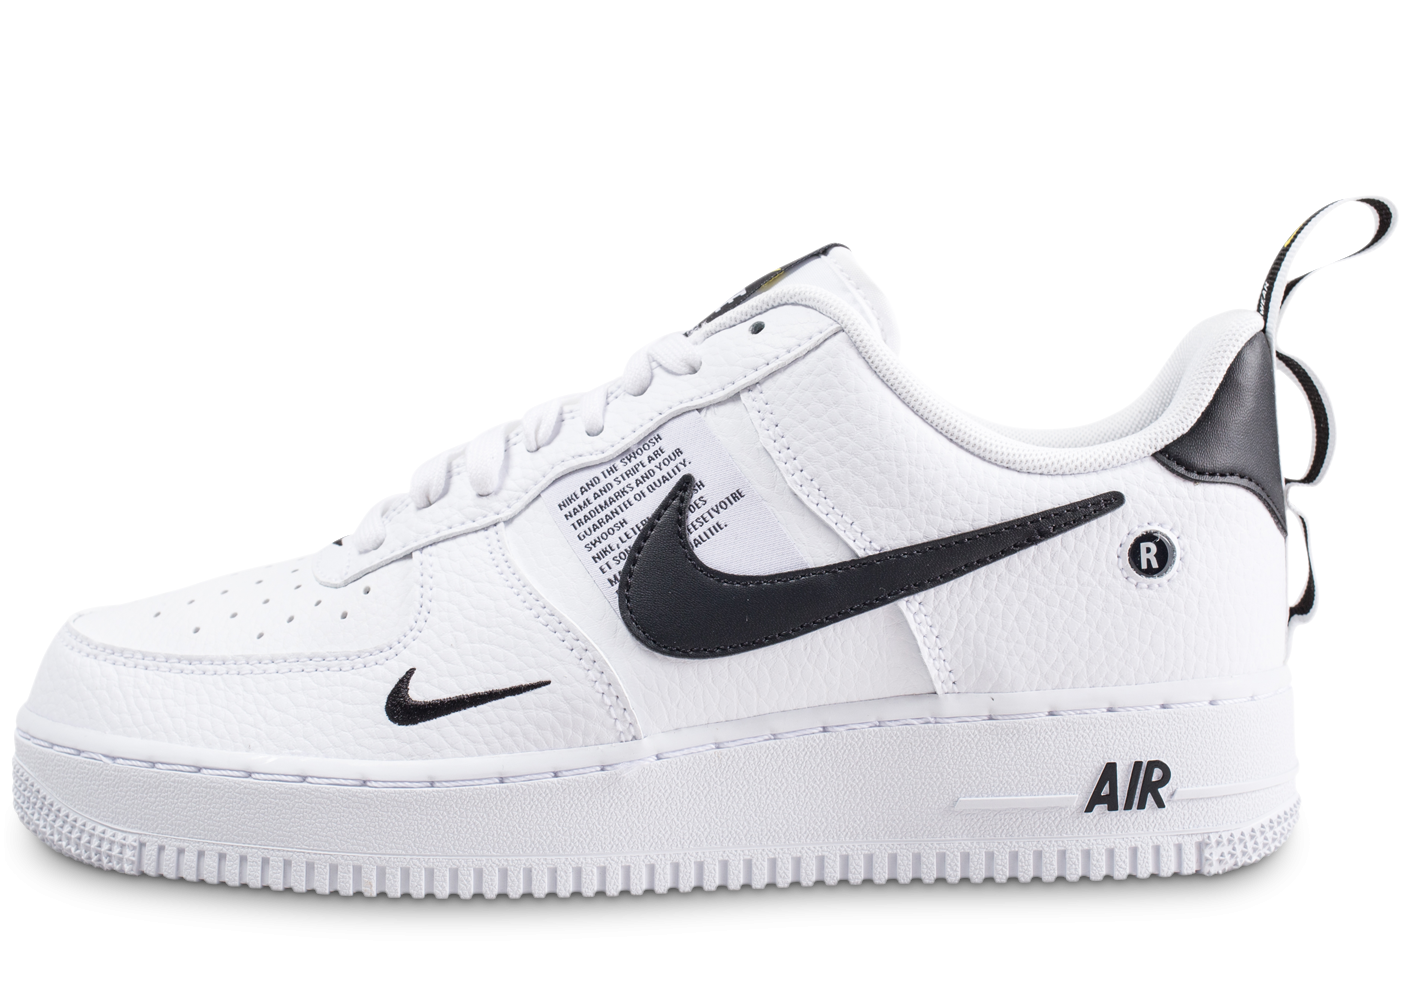 Nike Air Force 1 '07 Ao2423 103 Blanc pas cher Achat